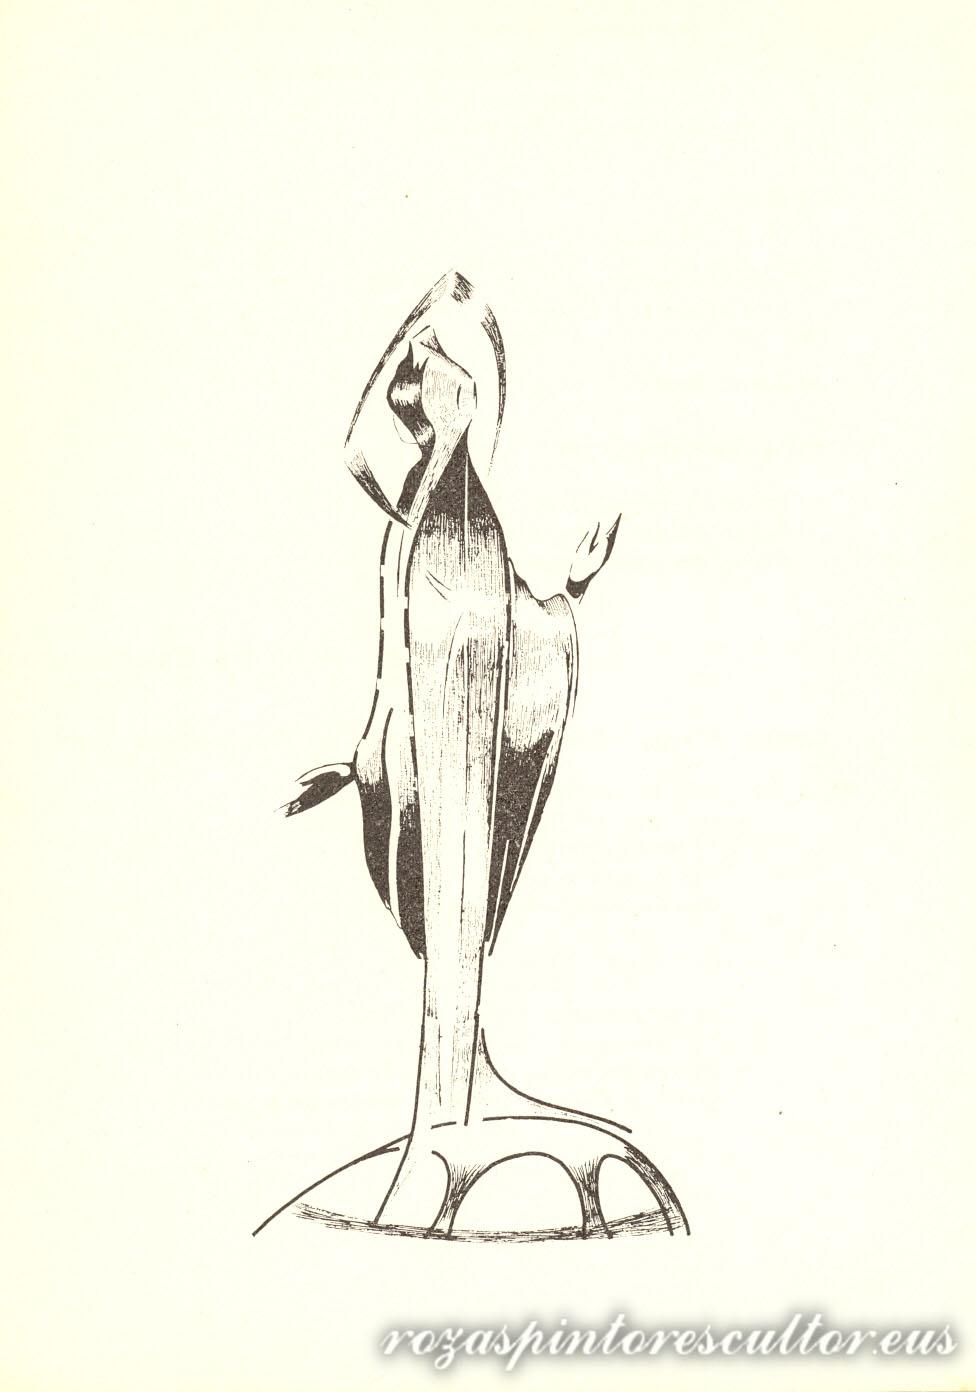 1966 Marian Misterioak 4